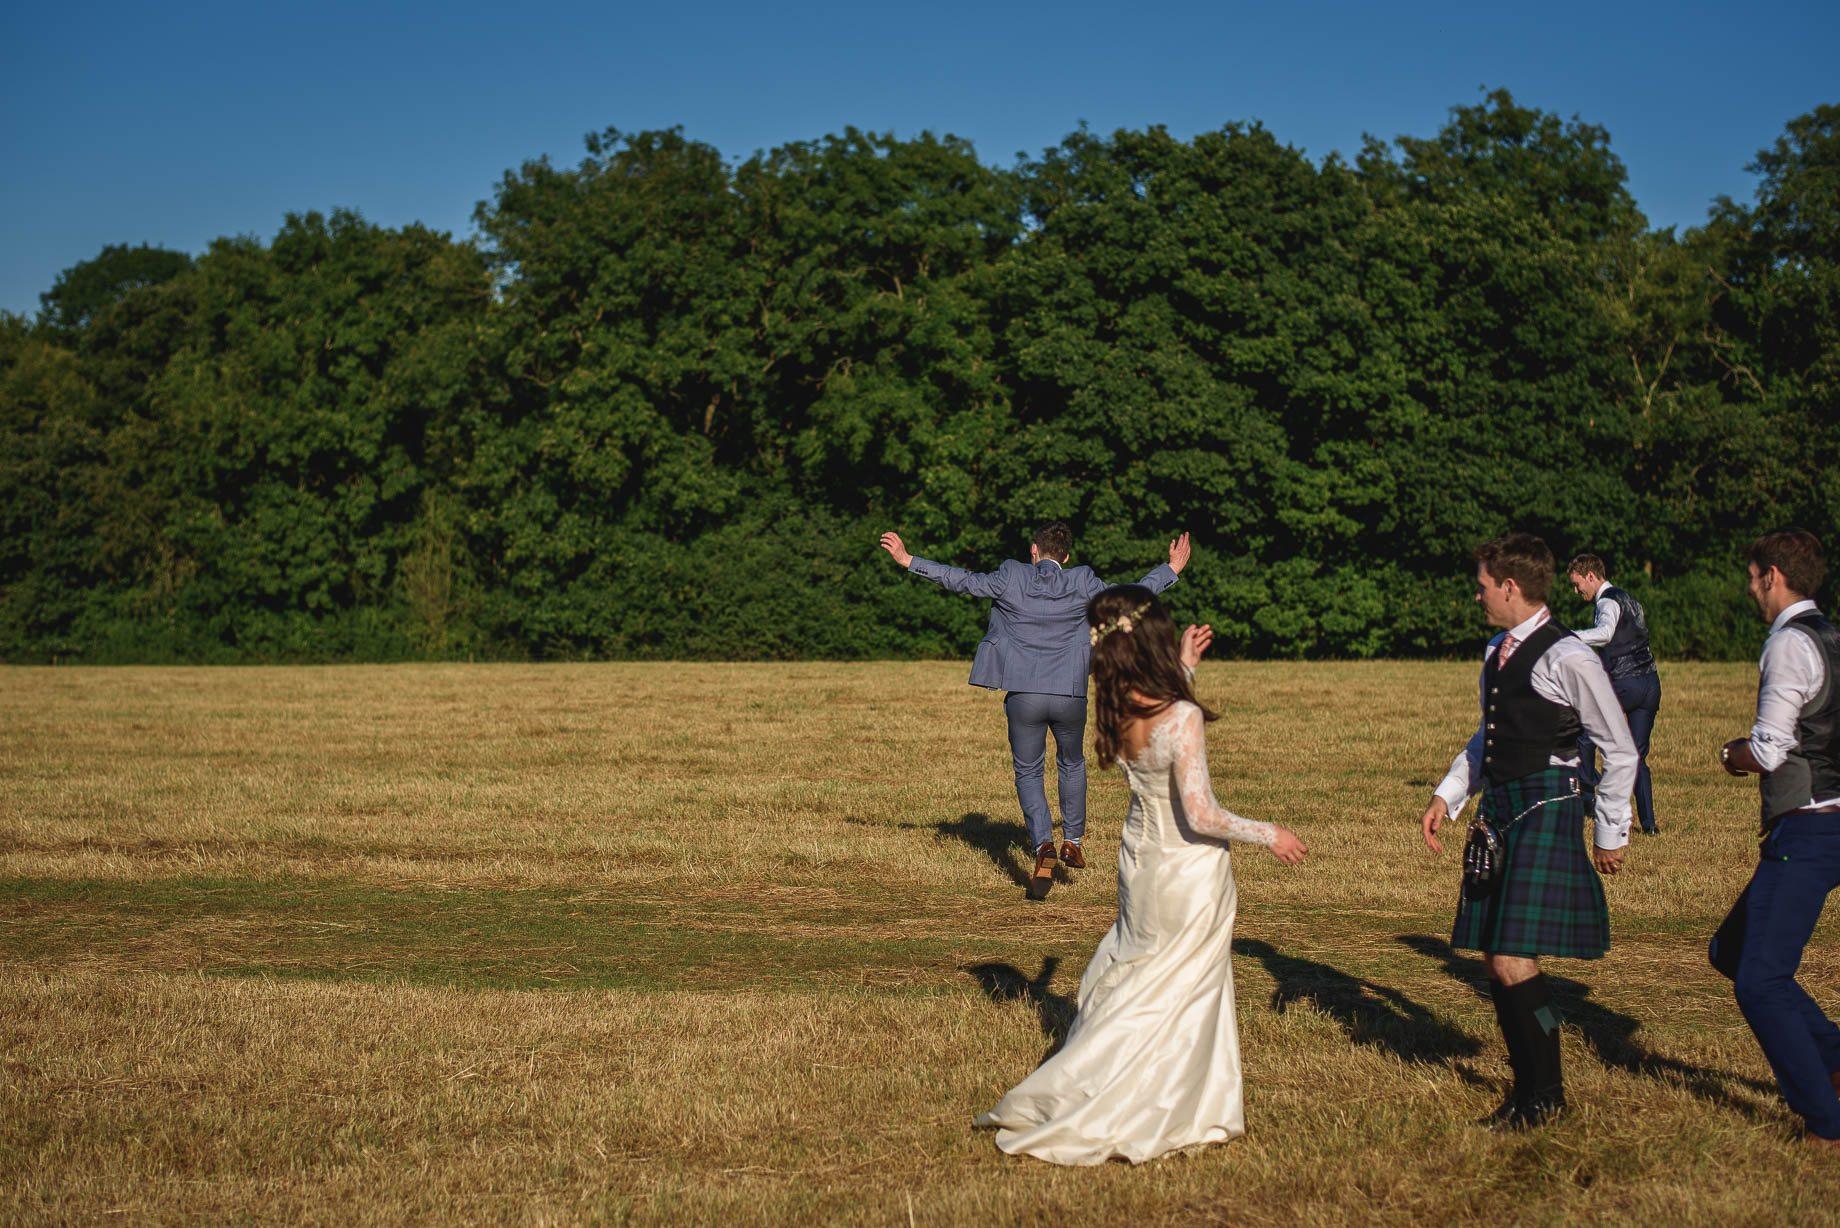 Gildings Barn wedding photography - Sarah and Steve (152 of 190)